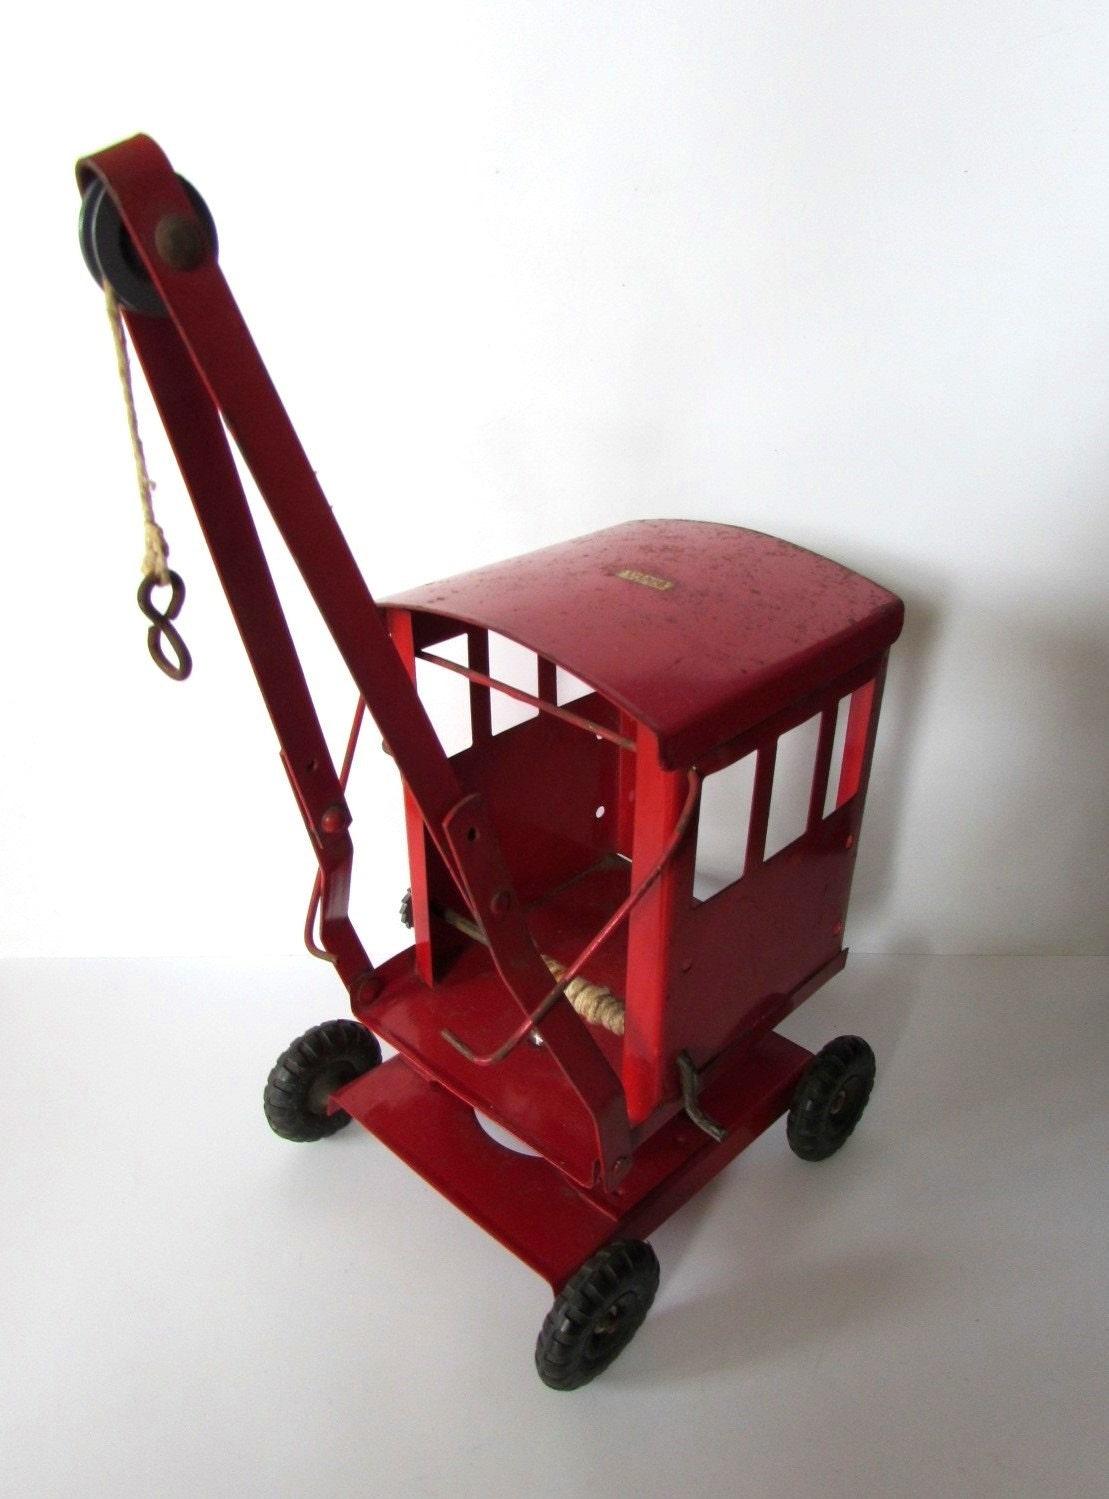 Vintage Childrens TRIANG Red Metal Tin Crane Toy Vehicle Wind Up Winch Swivel Base  Very Rare   MEMsArtShop.